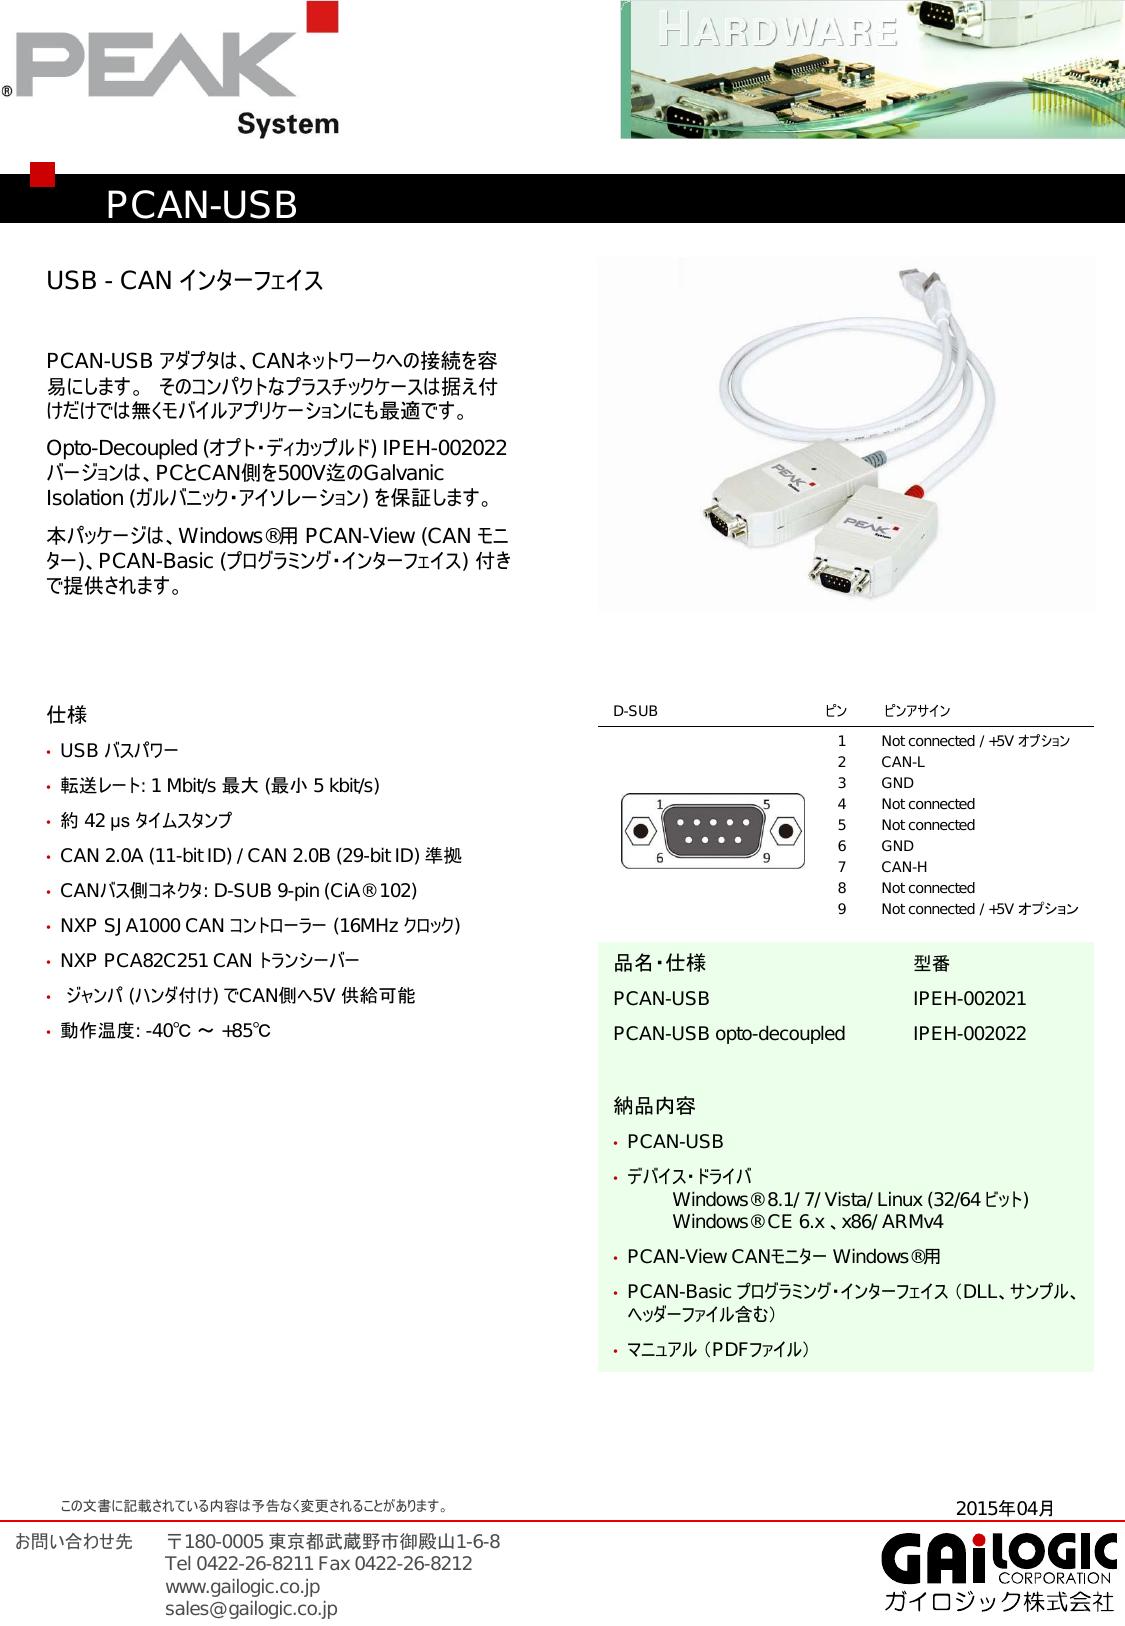 Pcan Usb(ガイロジック株式会社)のカタログ無料ダウンロード|製造業向けカタログポータル Aperza